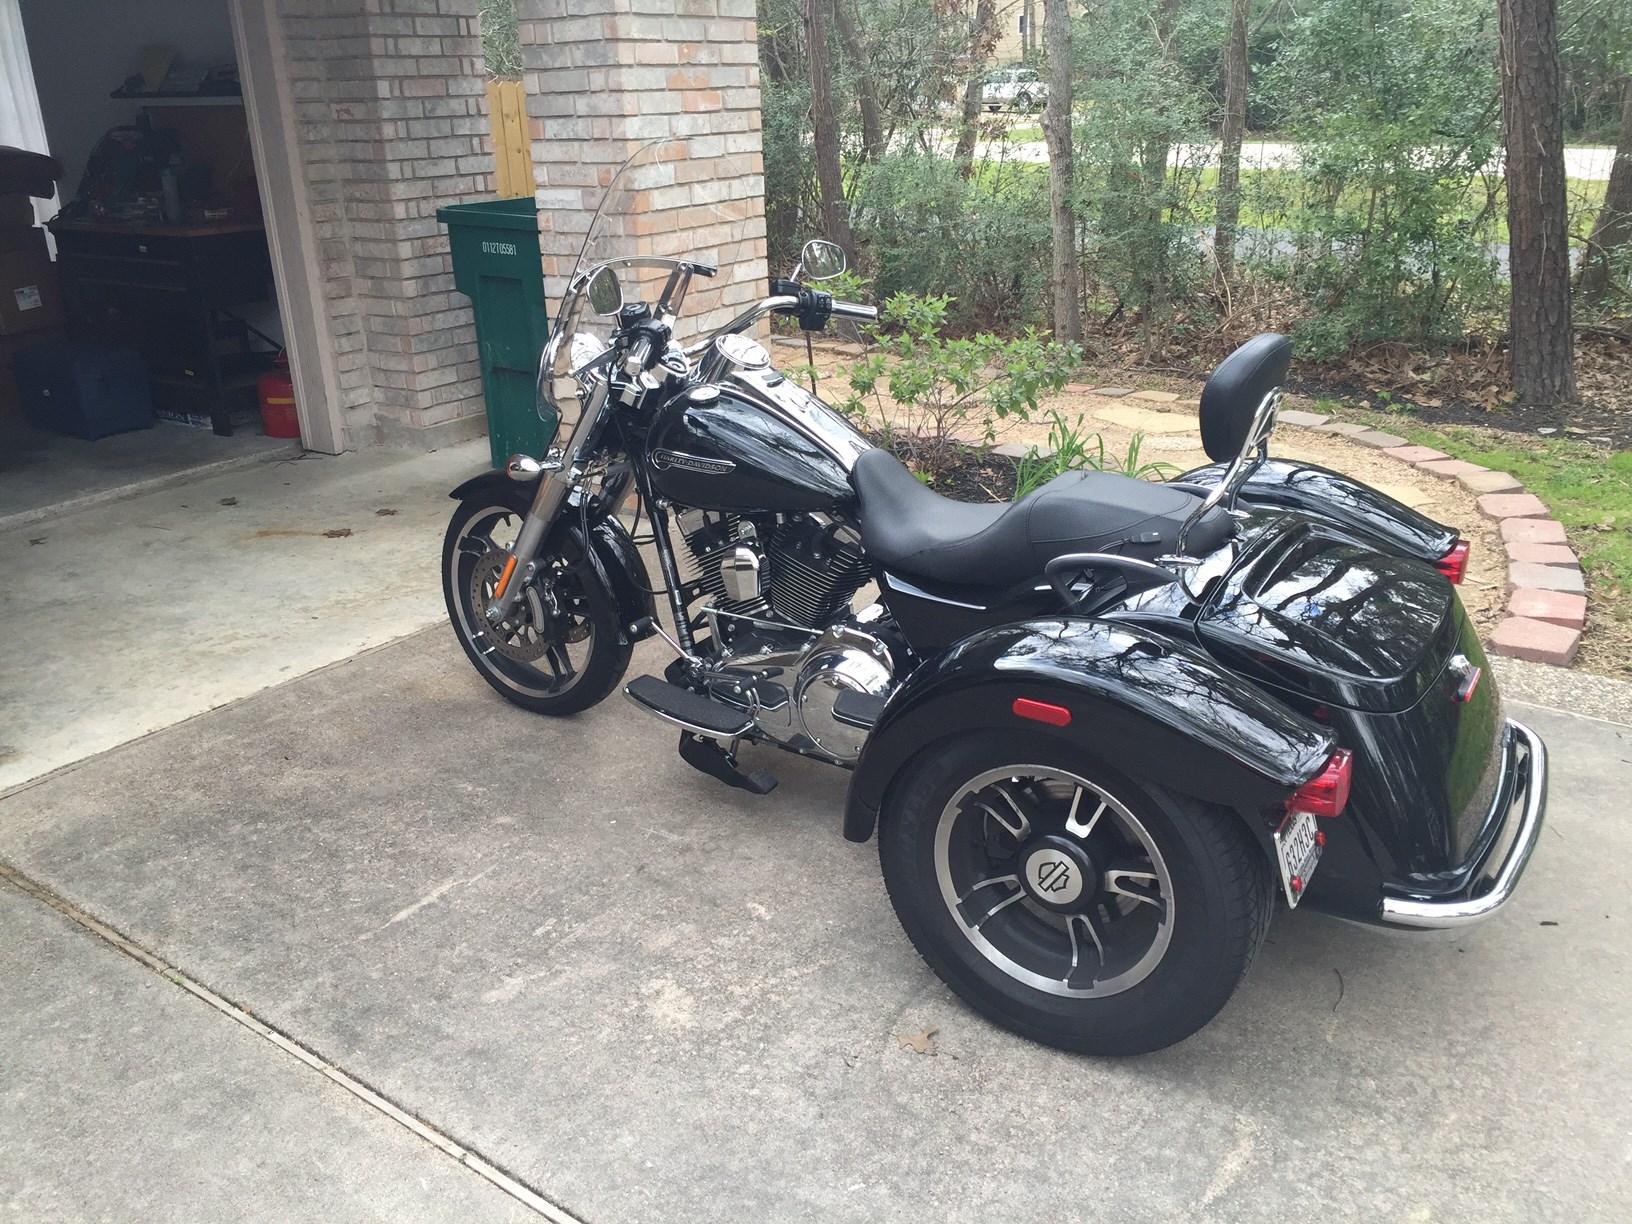 Harley Davidson Chico Ca >> 2015 Harley-Davidson® FLRT Freewheeler™ (Black), The ...